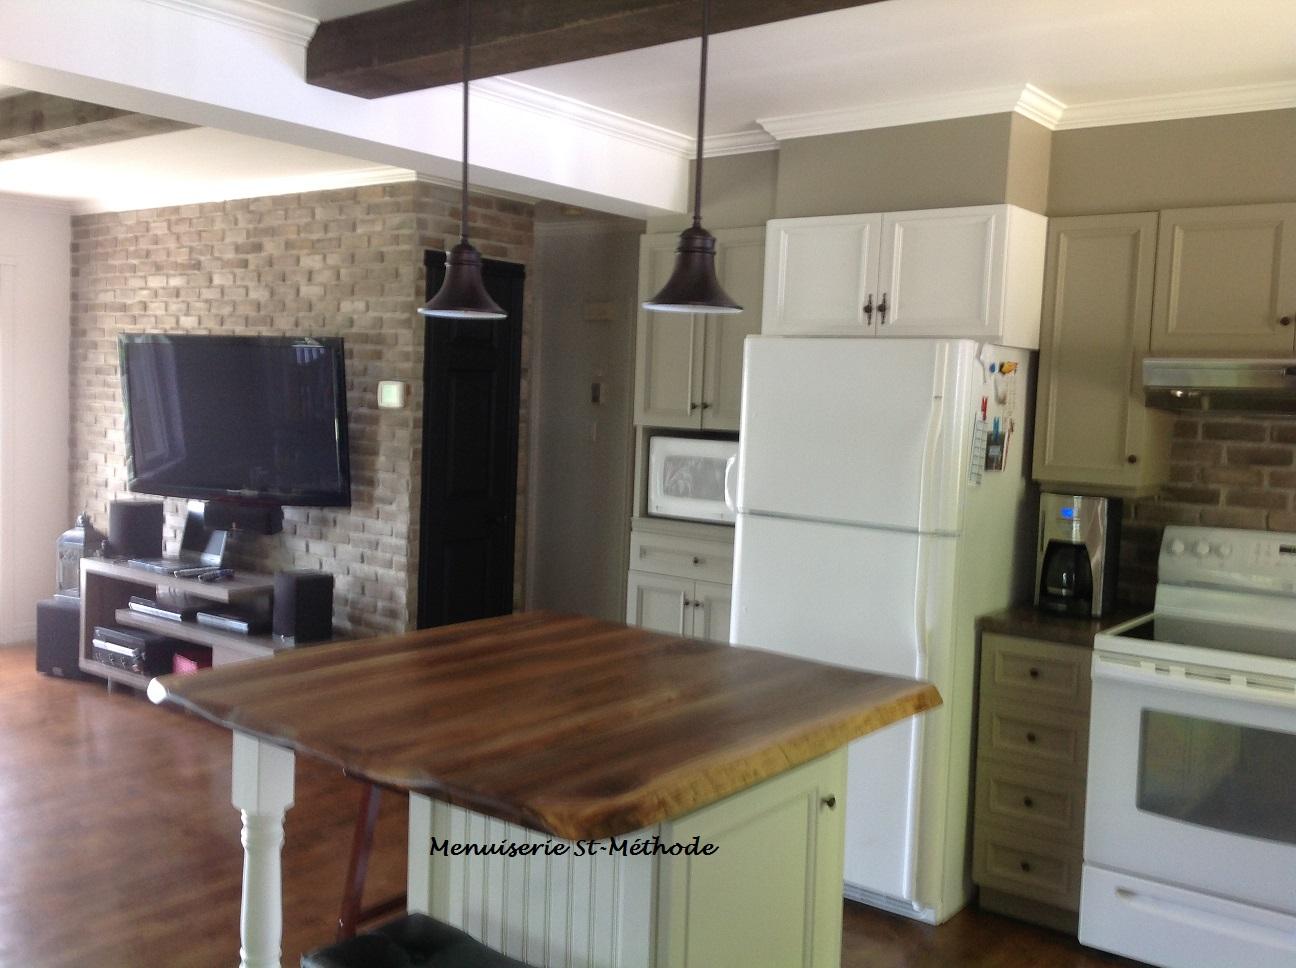 menuiserie st m thode comptoir en bois. Black Bedroom Furniture Sets. Home Design Ideas